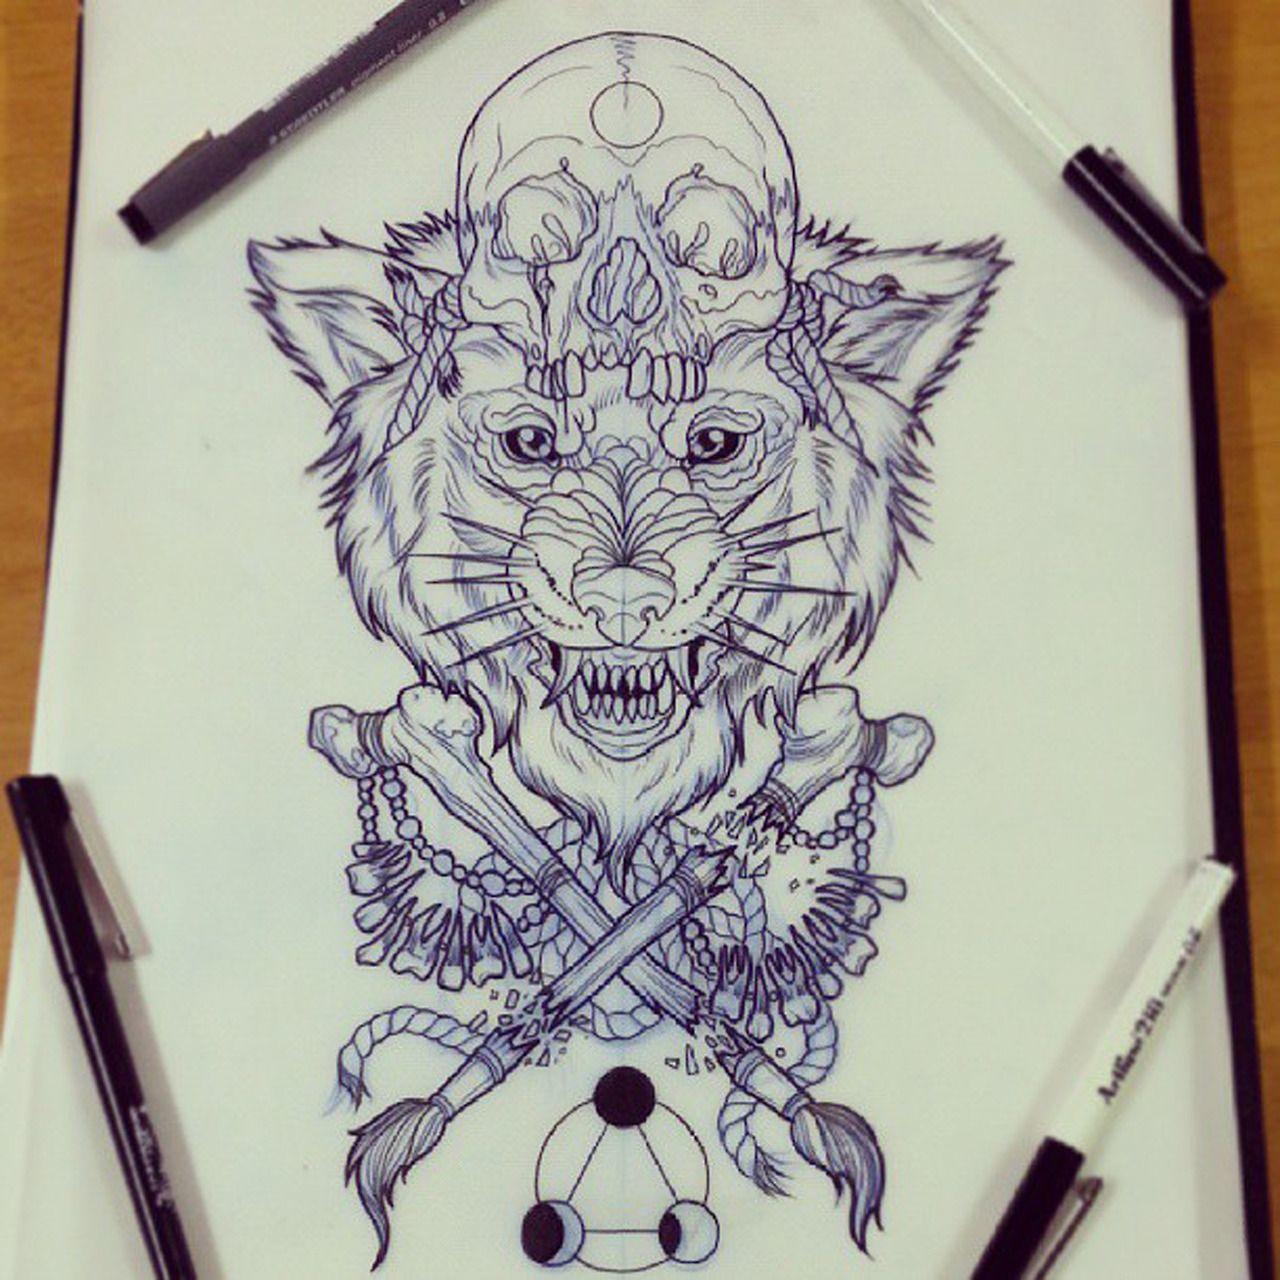 Tattoo Design Tumblr Buscar Con Google Guaton Tattoo Pinterest